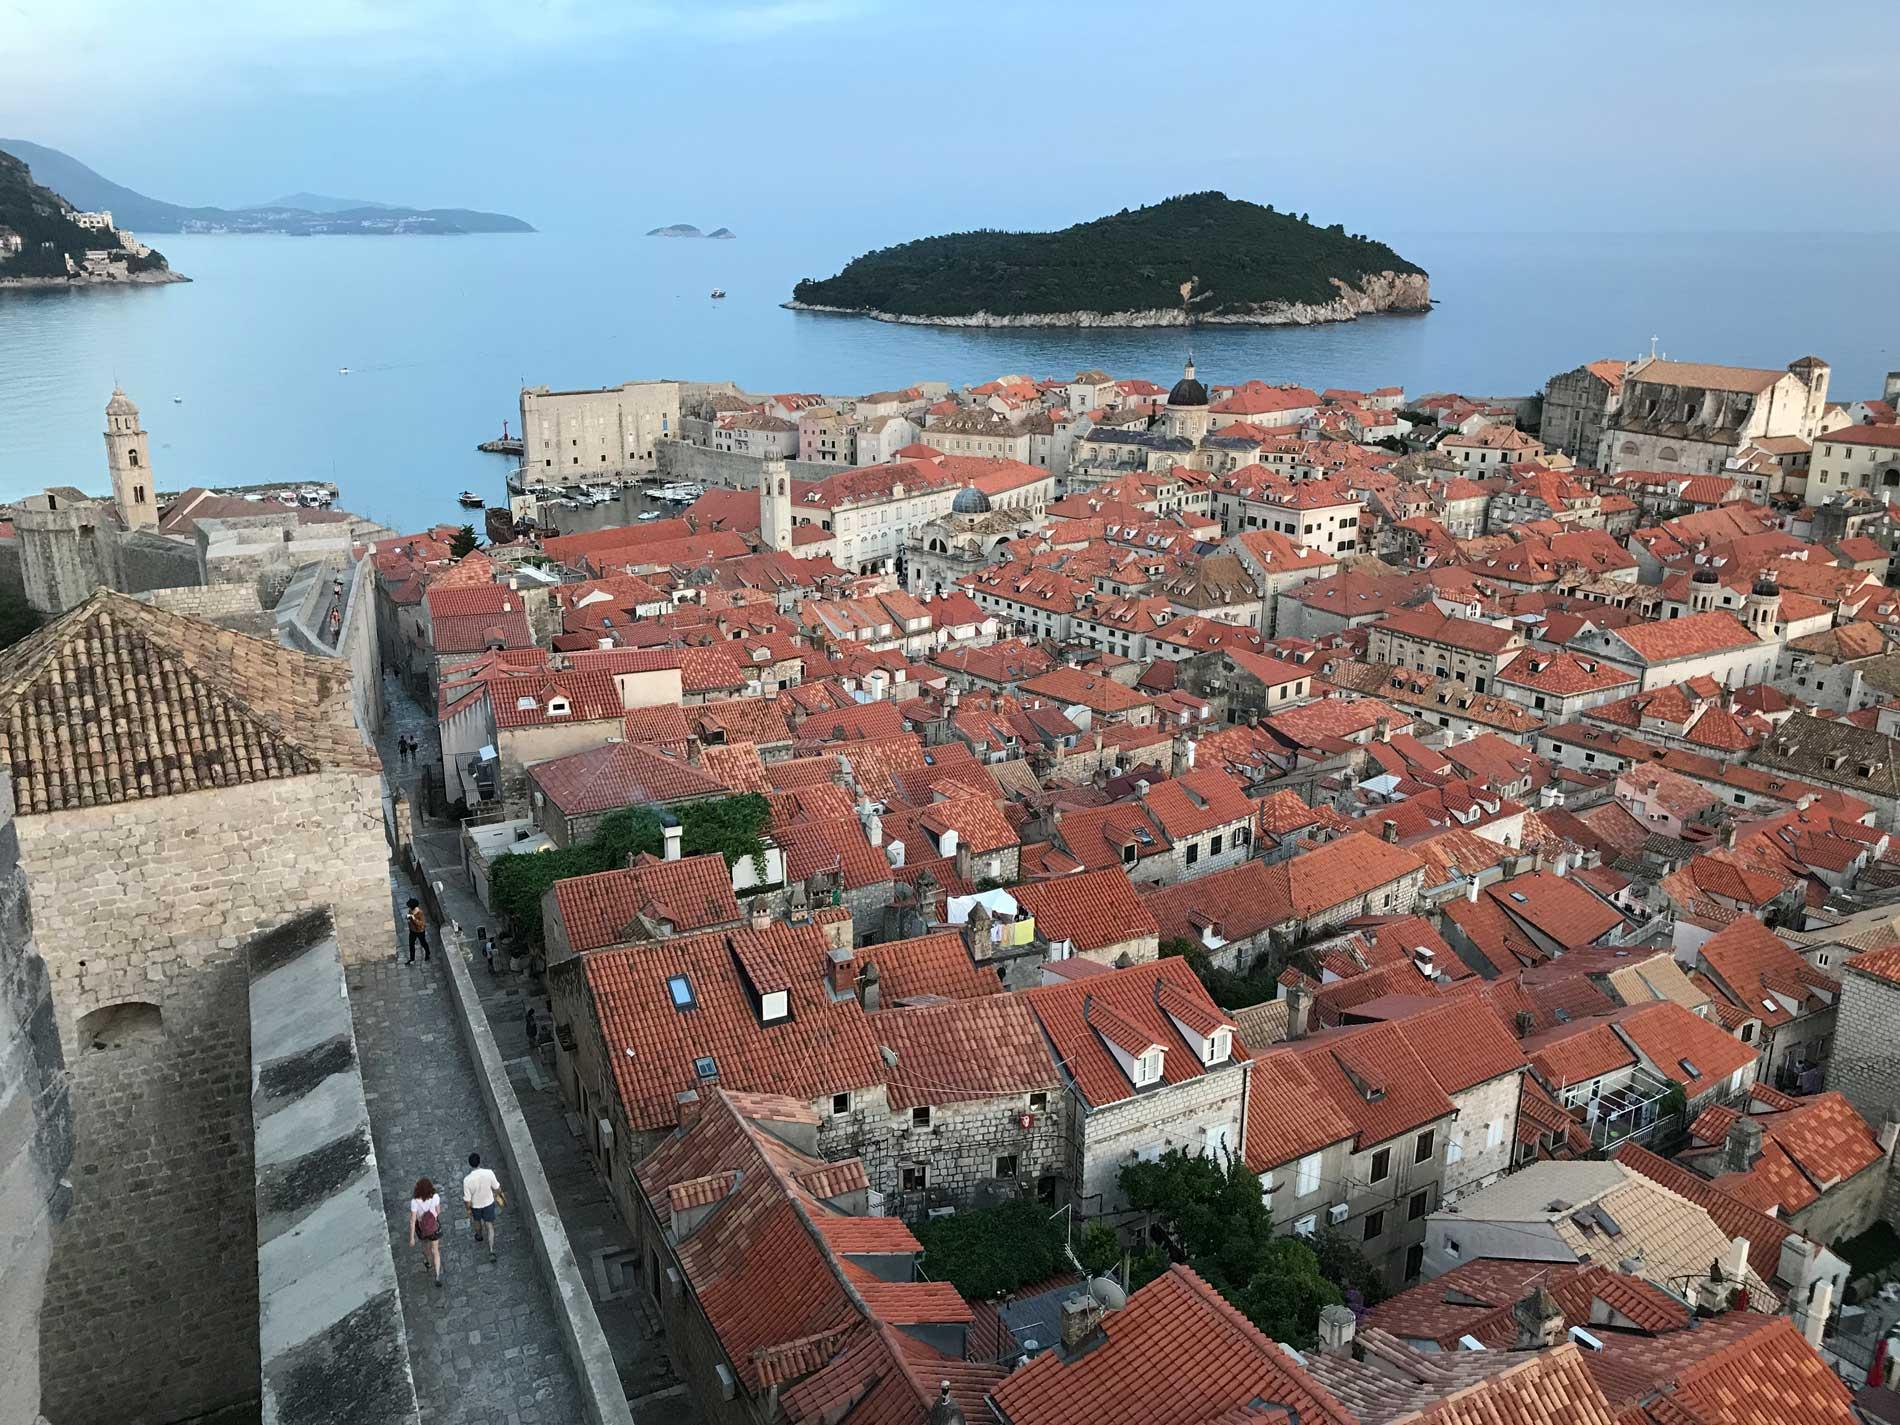 Dubrovnik-Croazia-panorama-Torre-Minceta-tour-delle-mura